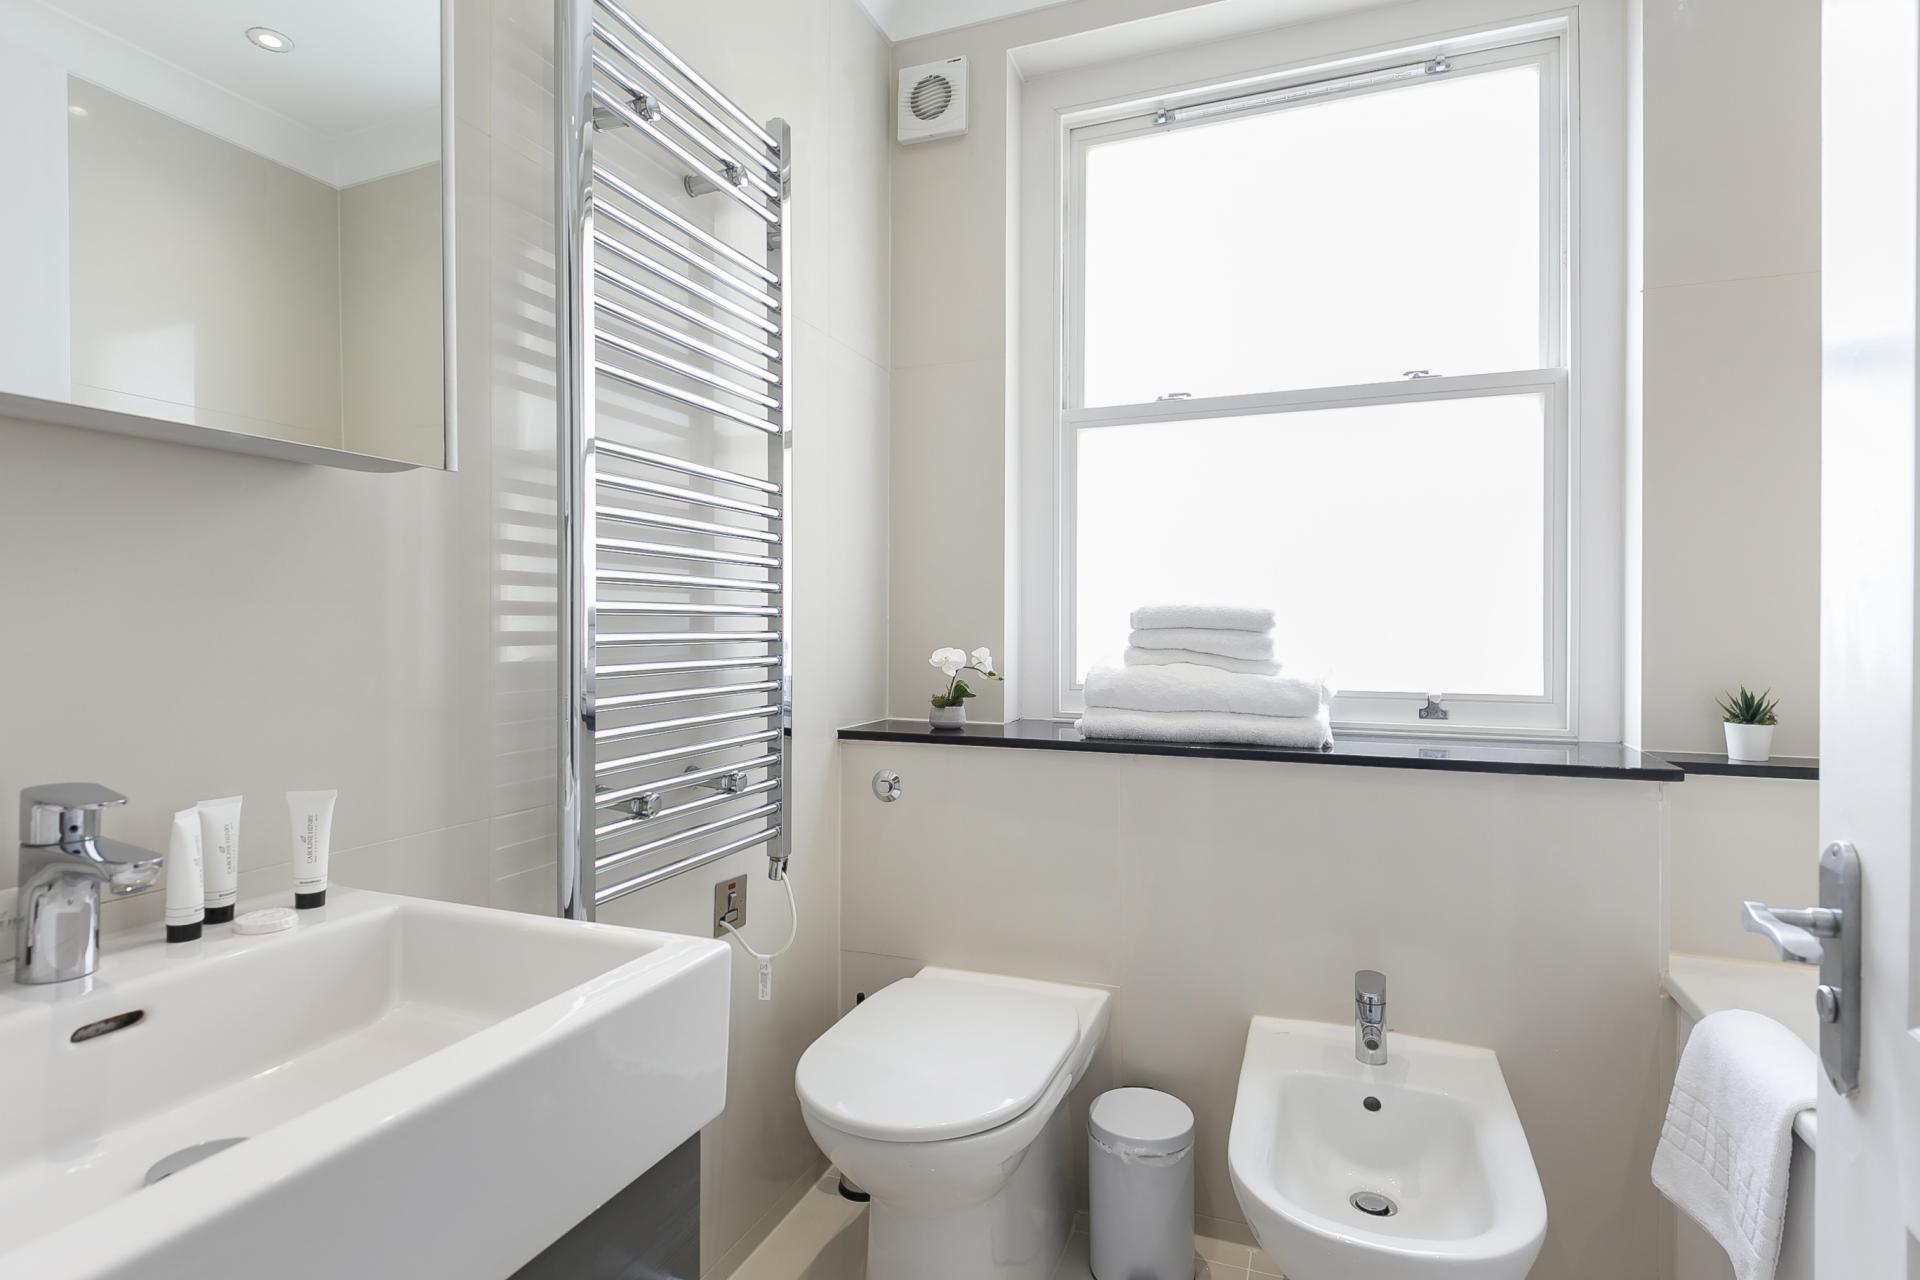 Bath at Chilworth Court Serviced Apartments, Paddington, London